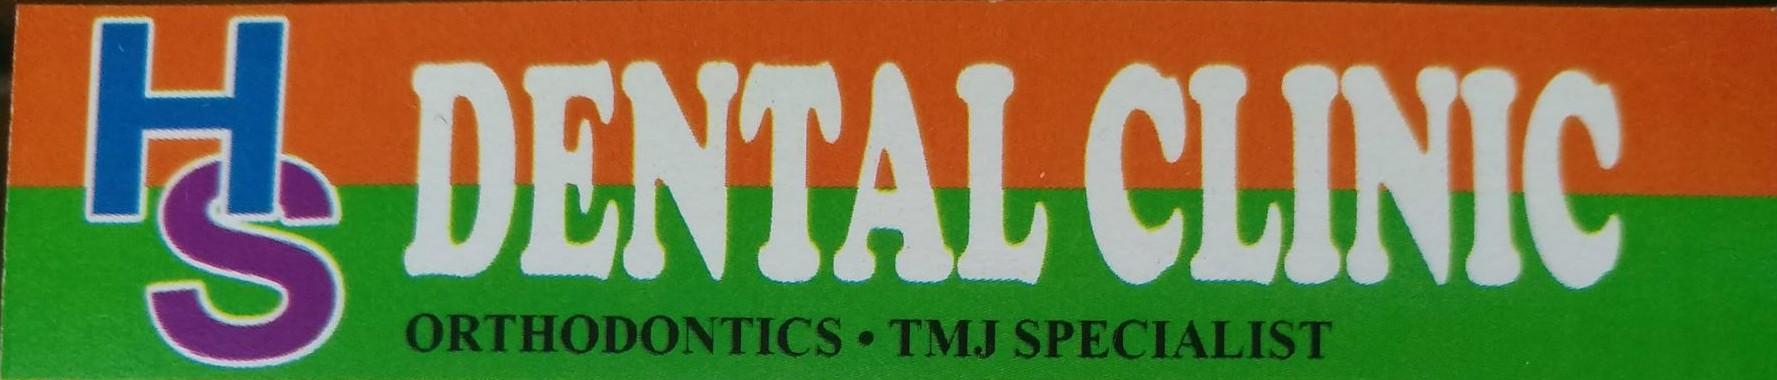 Hs Dental Clinic (Heaven Sent)